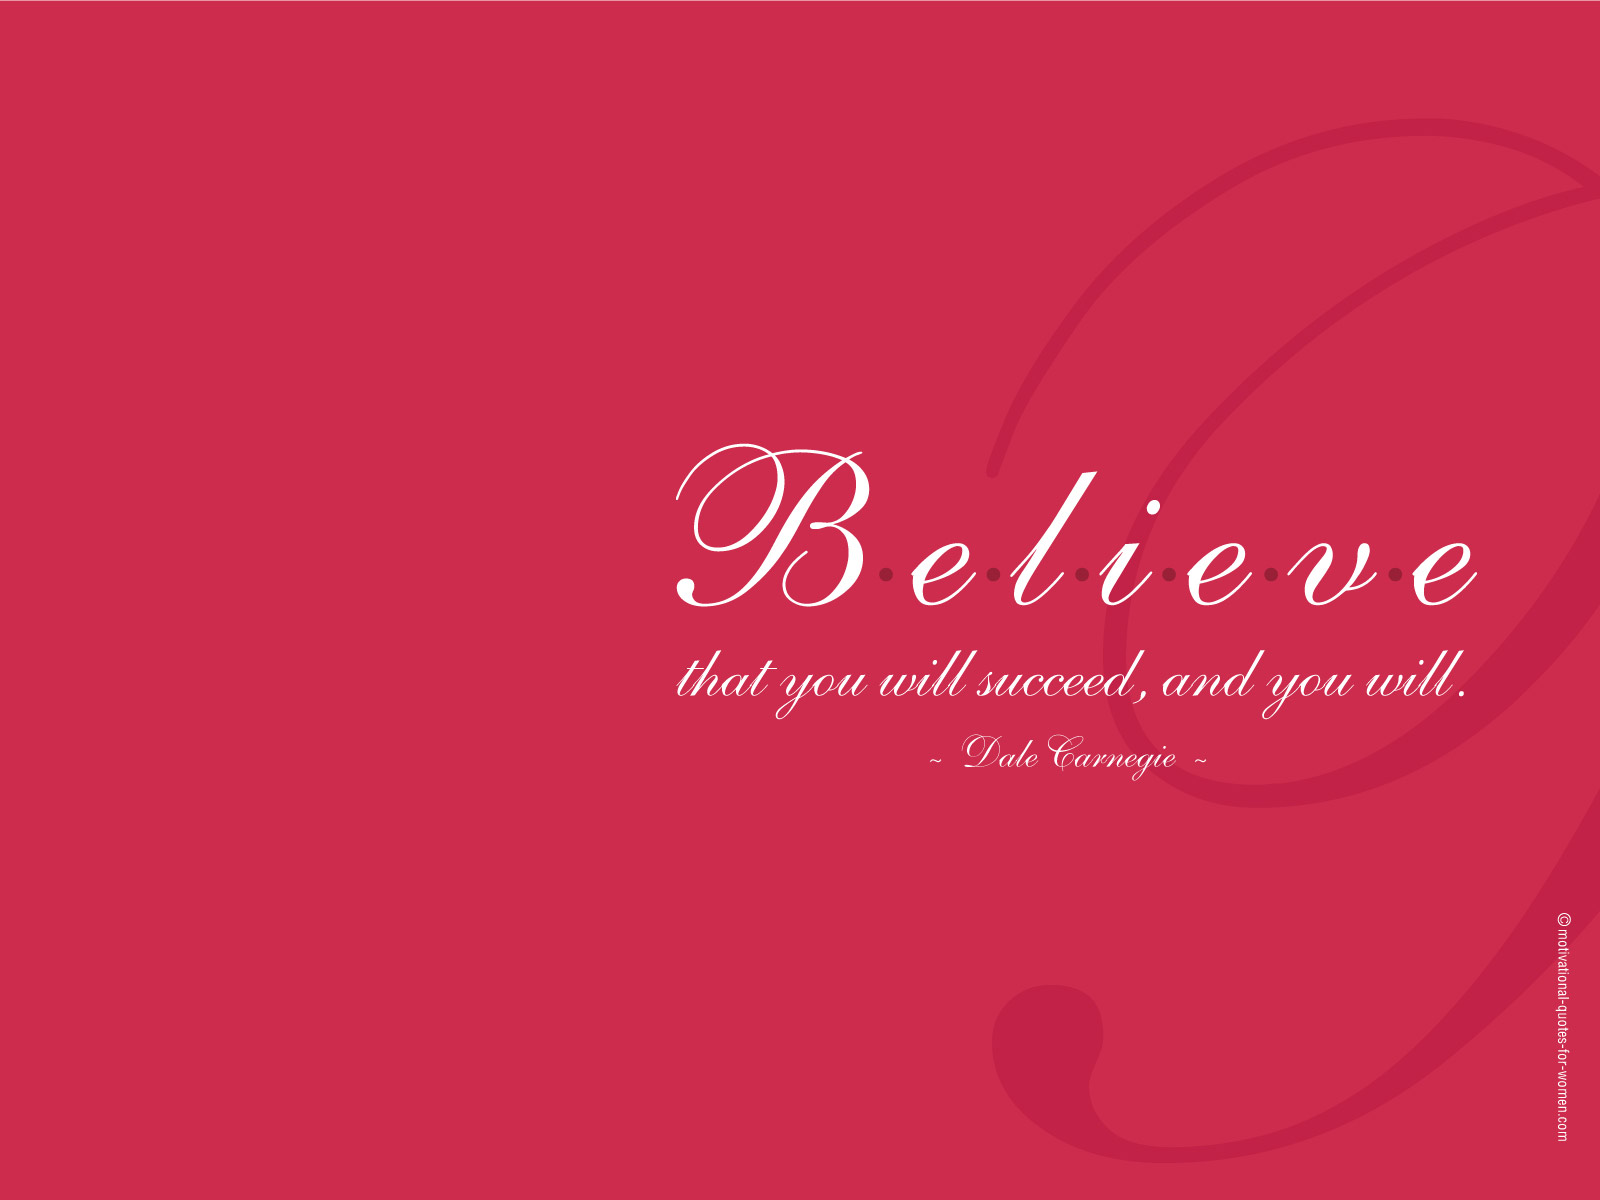 Inspirational Quotes Motivation: Inspirational Quotes. QuotesGram